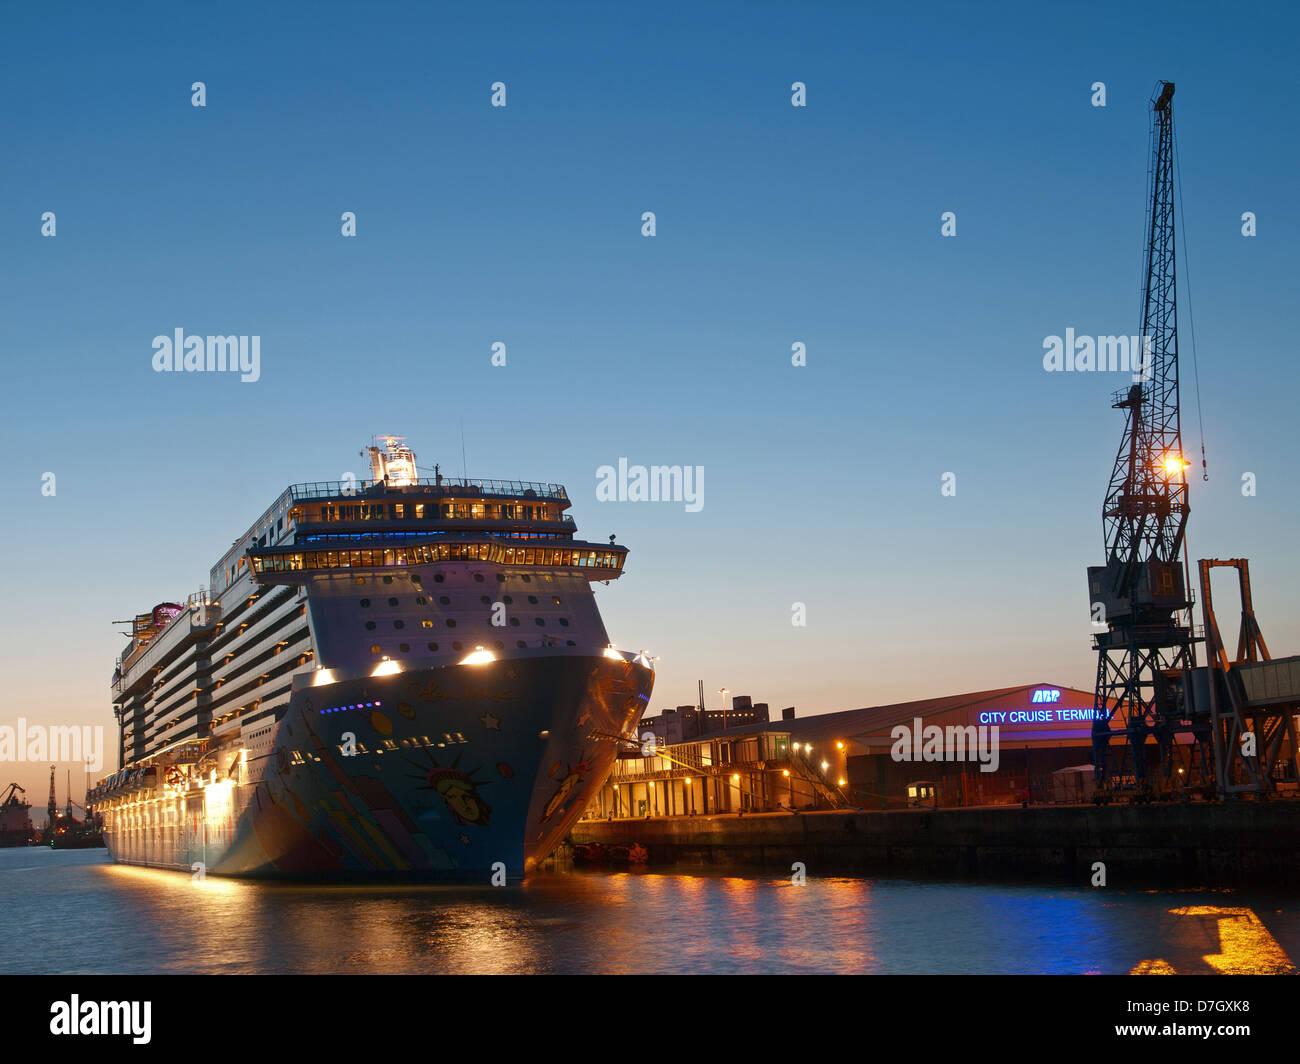 Cruise ship Norwegian Breakaway berthed at the City Cruise Terminal Southampton Port Hampshire England UK - Stock Image